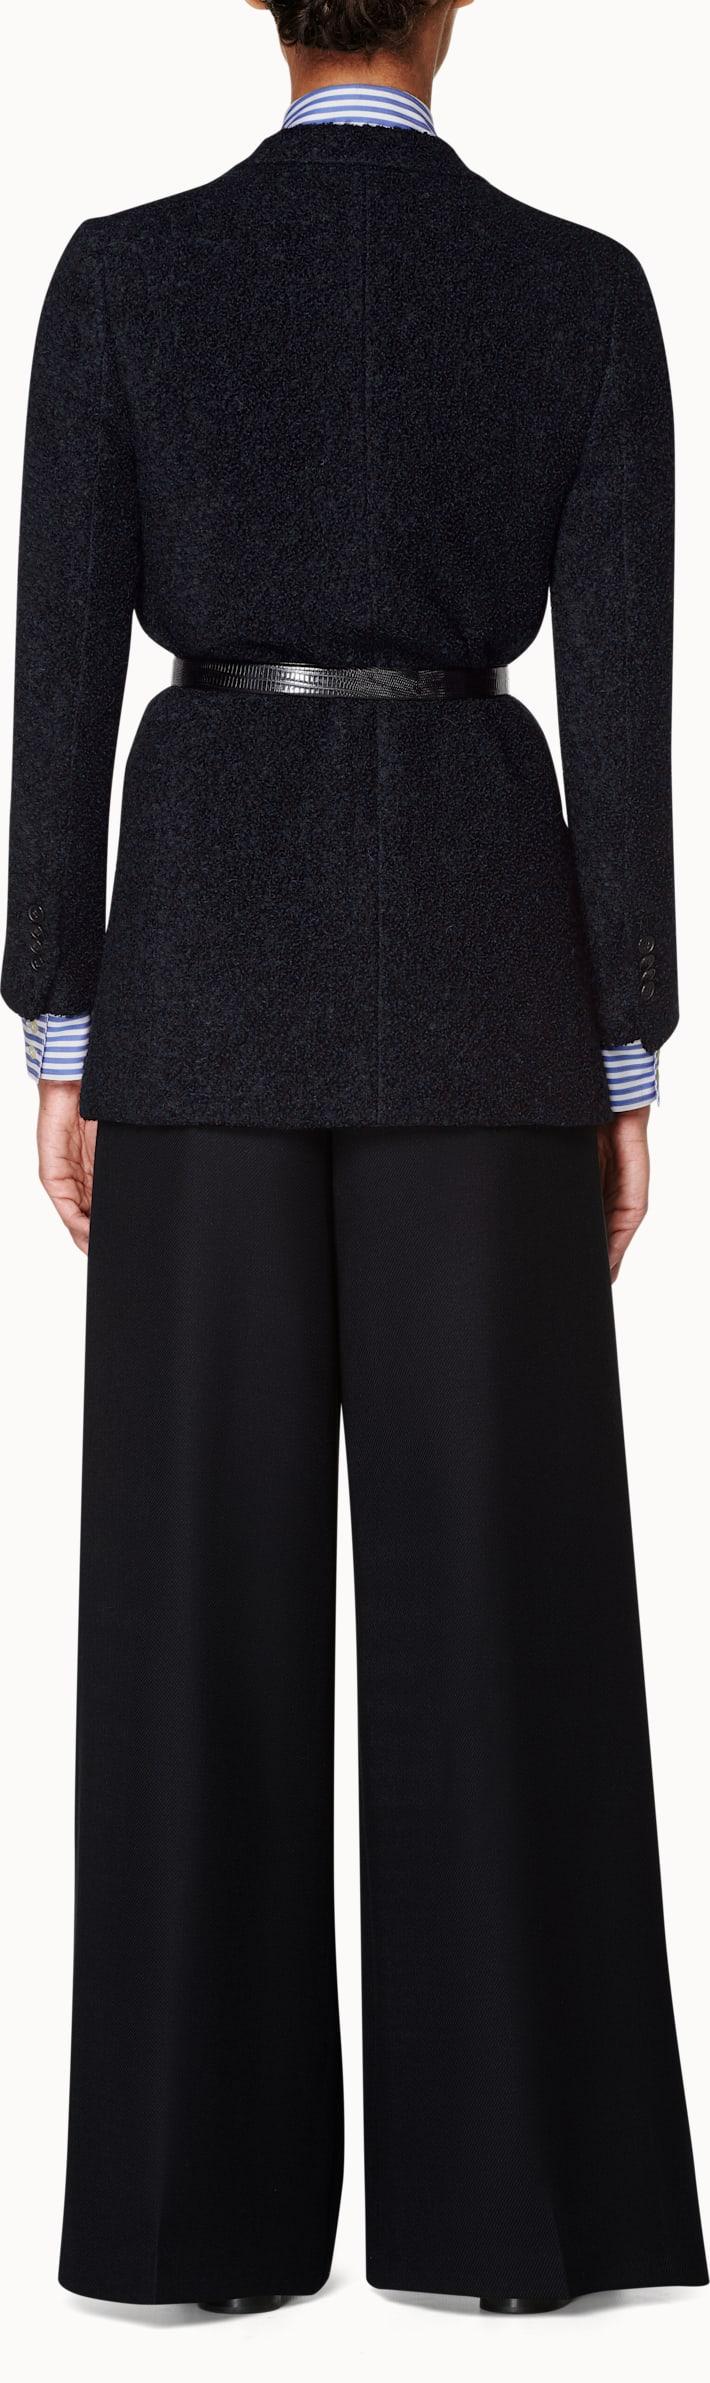 Navy Plain Teddy Coat